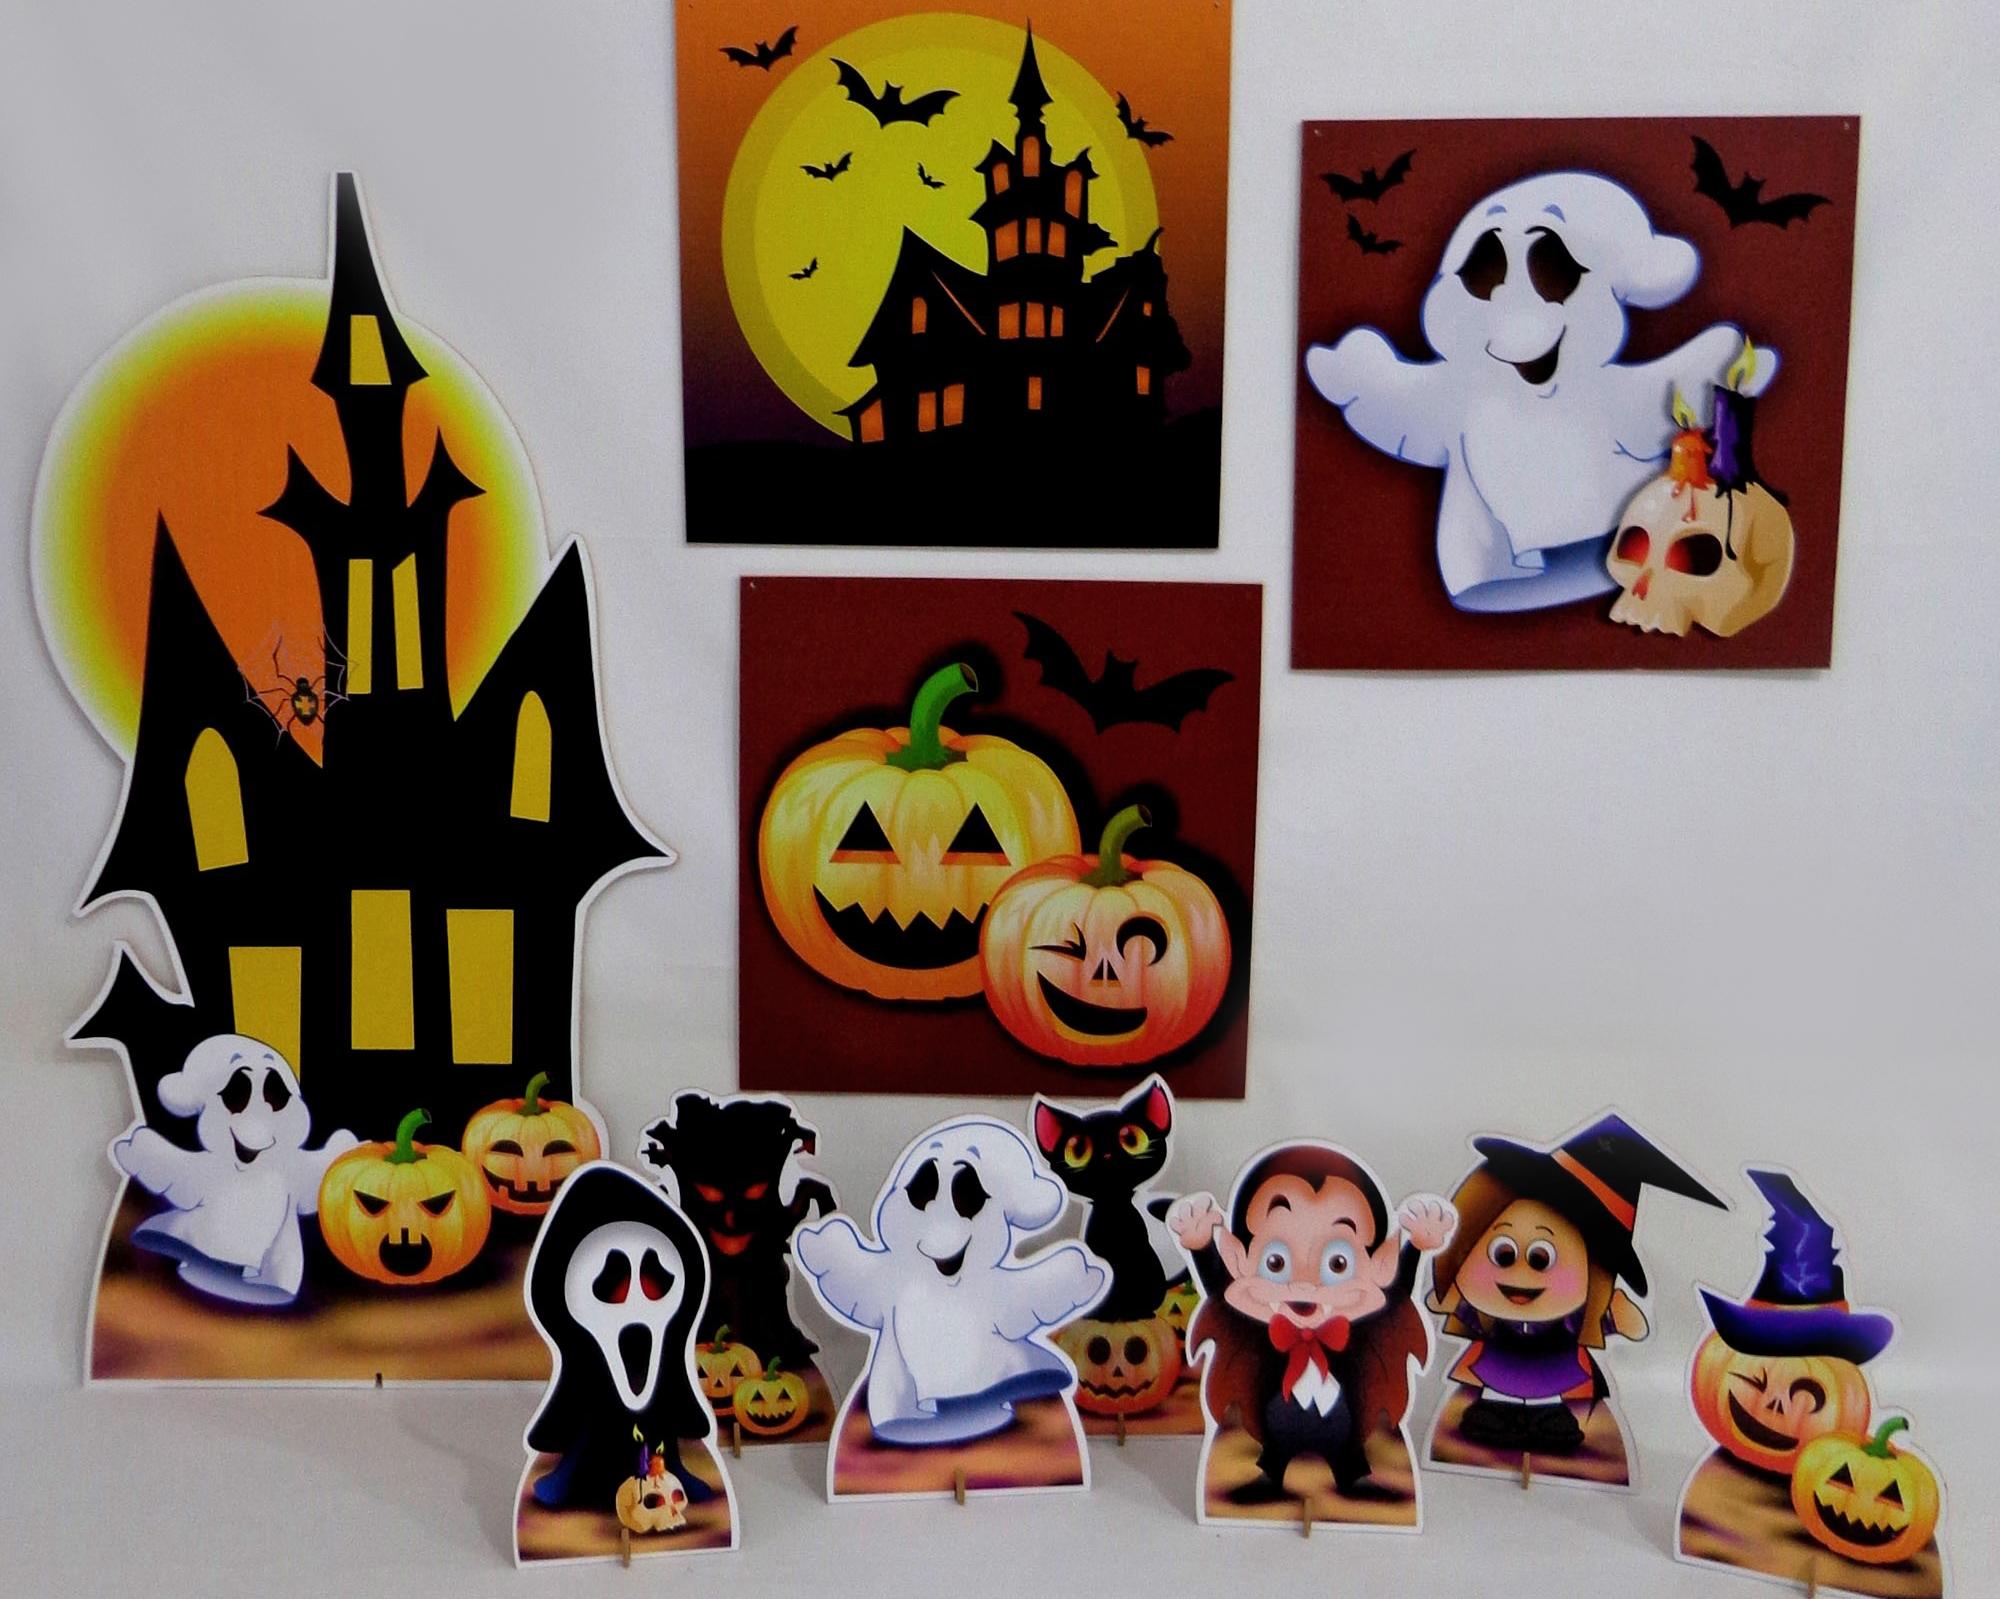 211709a15a5 Kit Decoração Festa Infantil Halloween